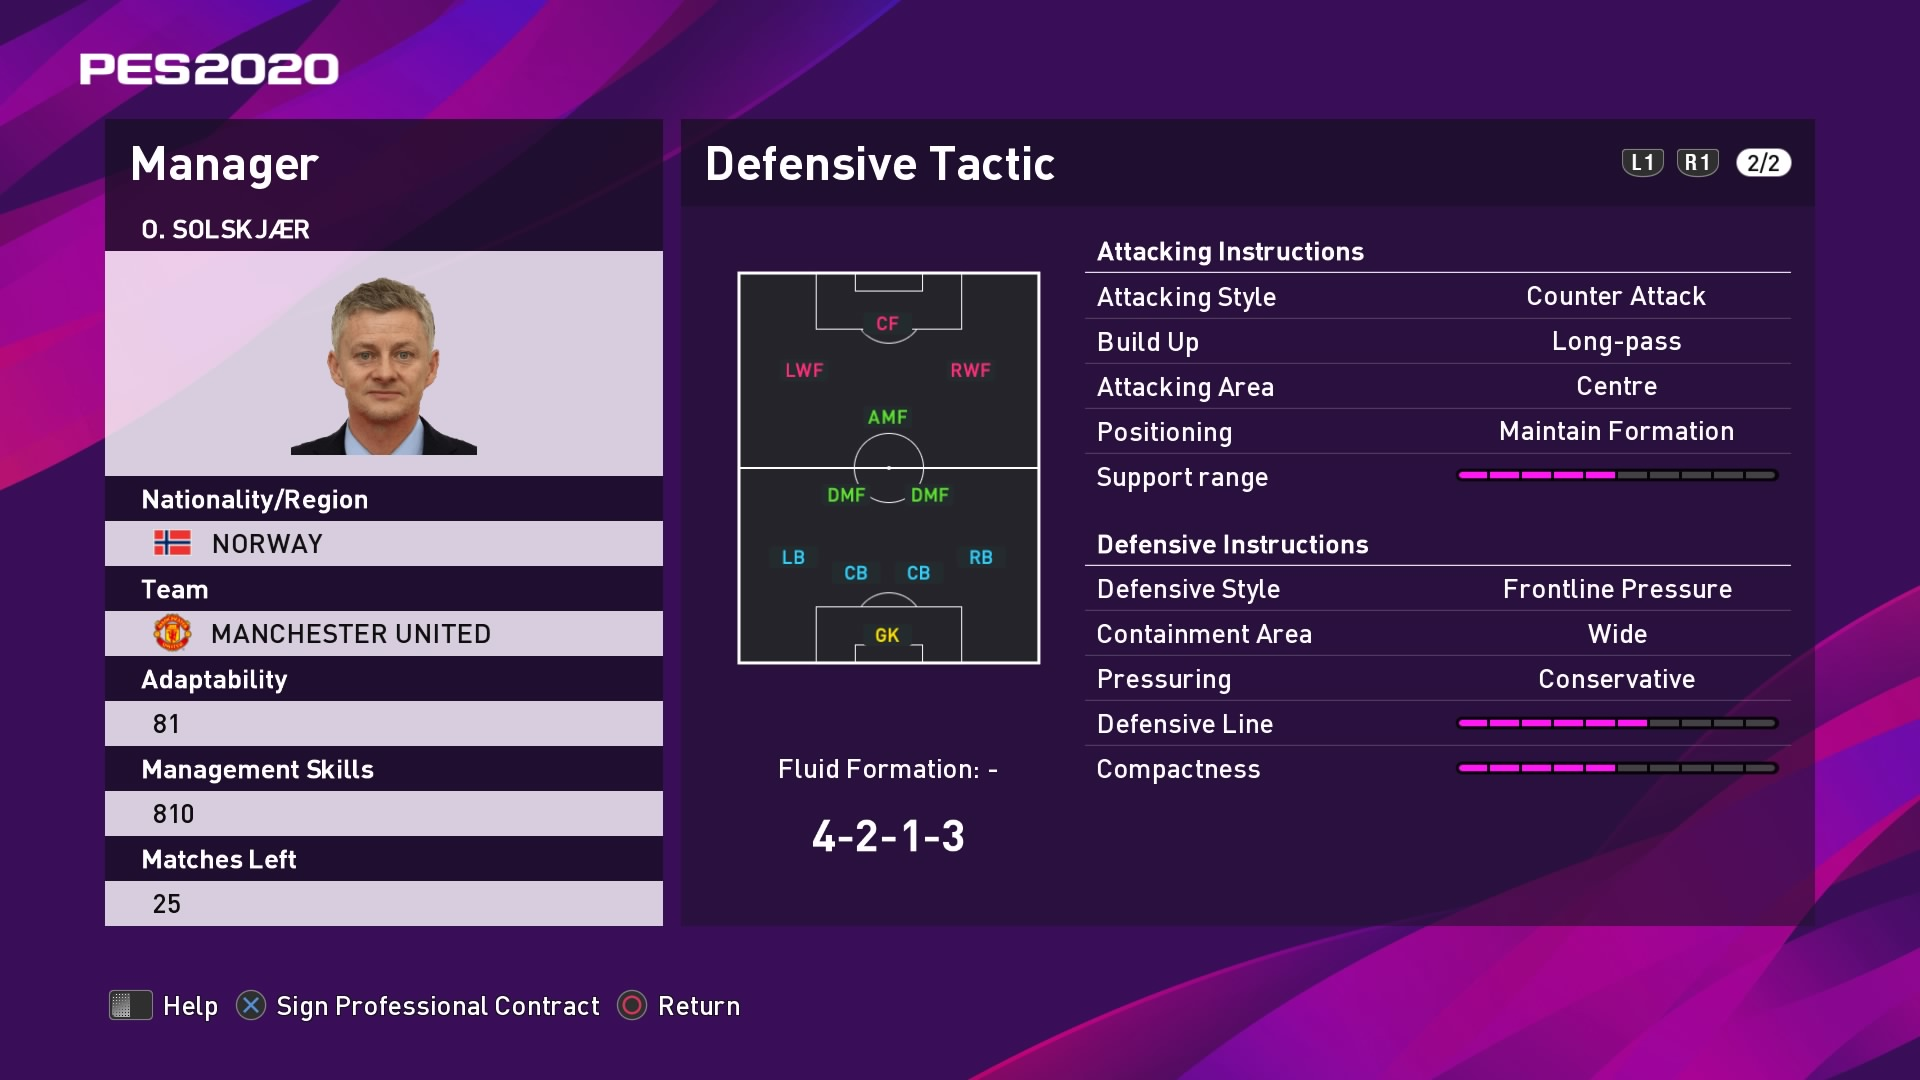 O. Solskjaer (3) (Ole Gunnar Solskjær) Defensive Tactic in PES 2020 myClub